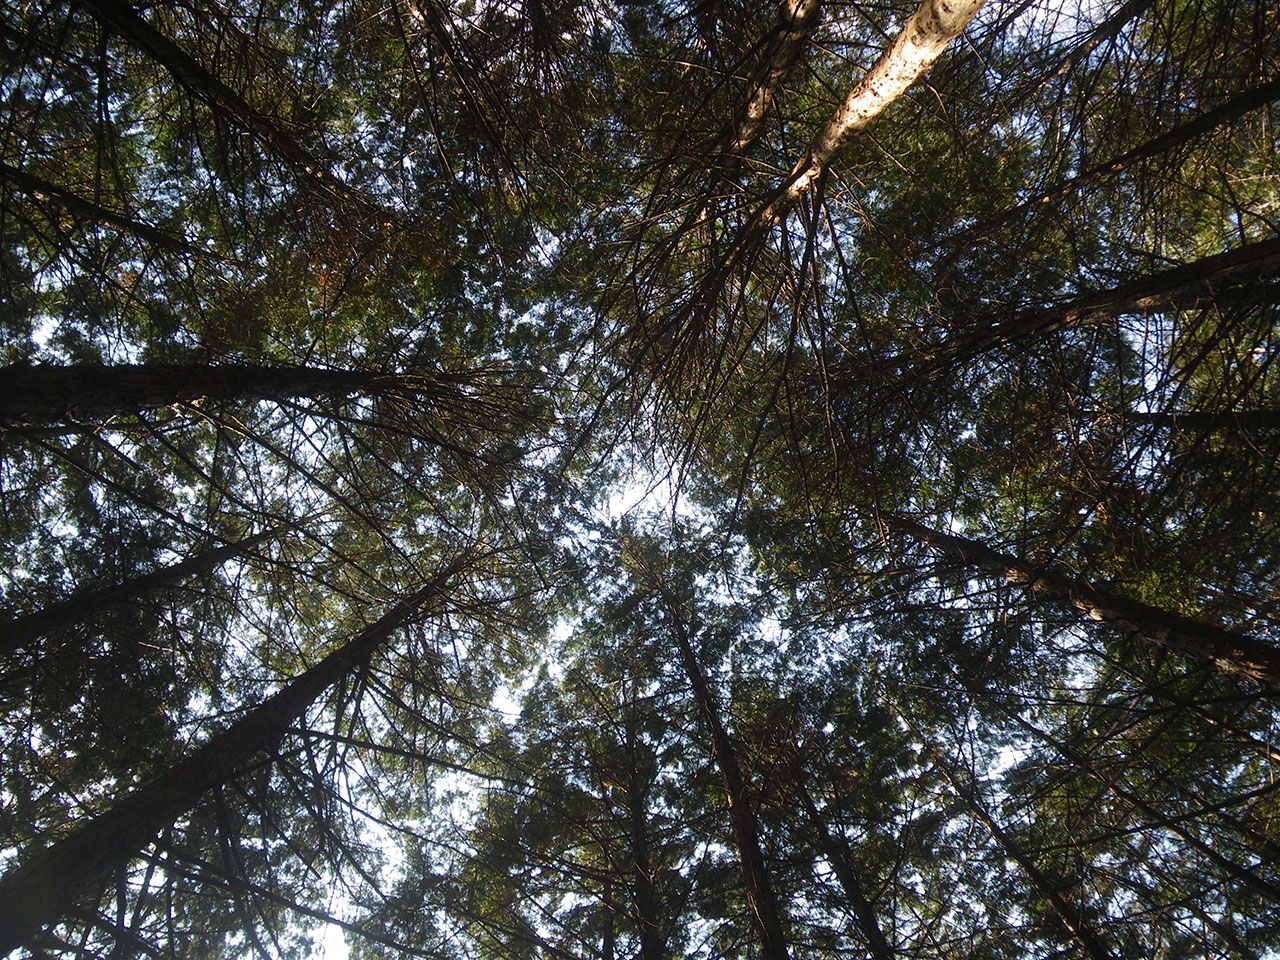 pentax w60で撮影した木々